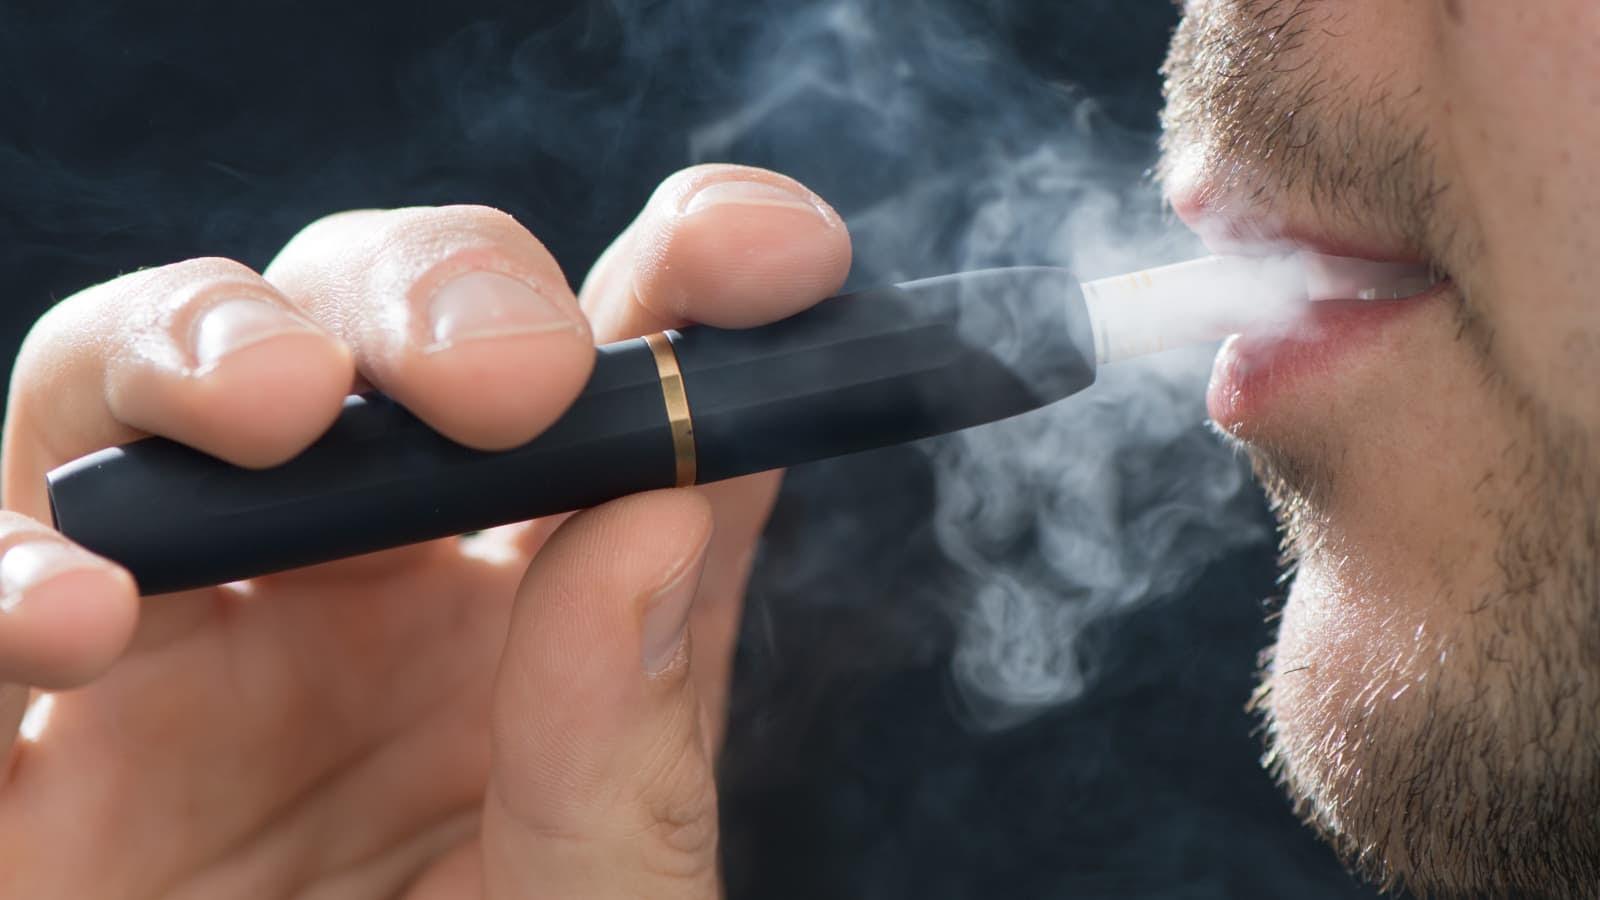 House Democrats' tax hike on tobacco, vaping may violate Biden's pledge